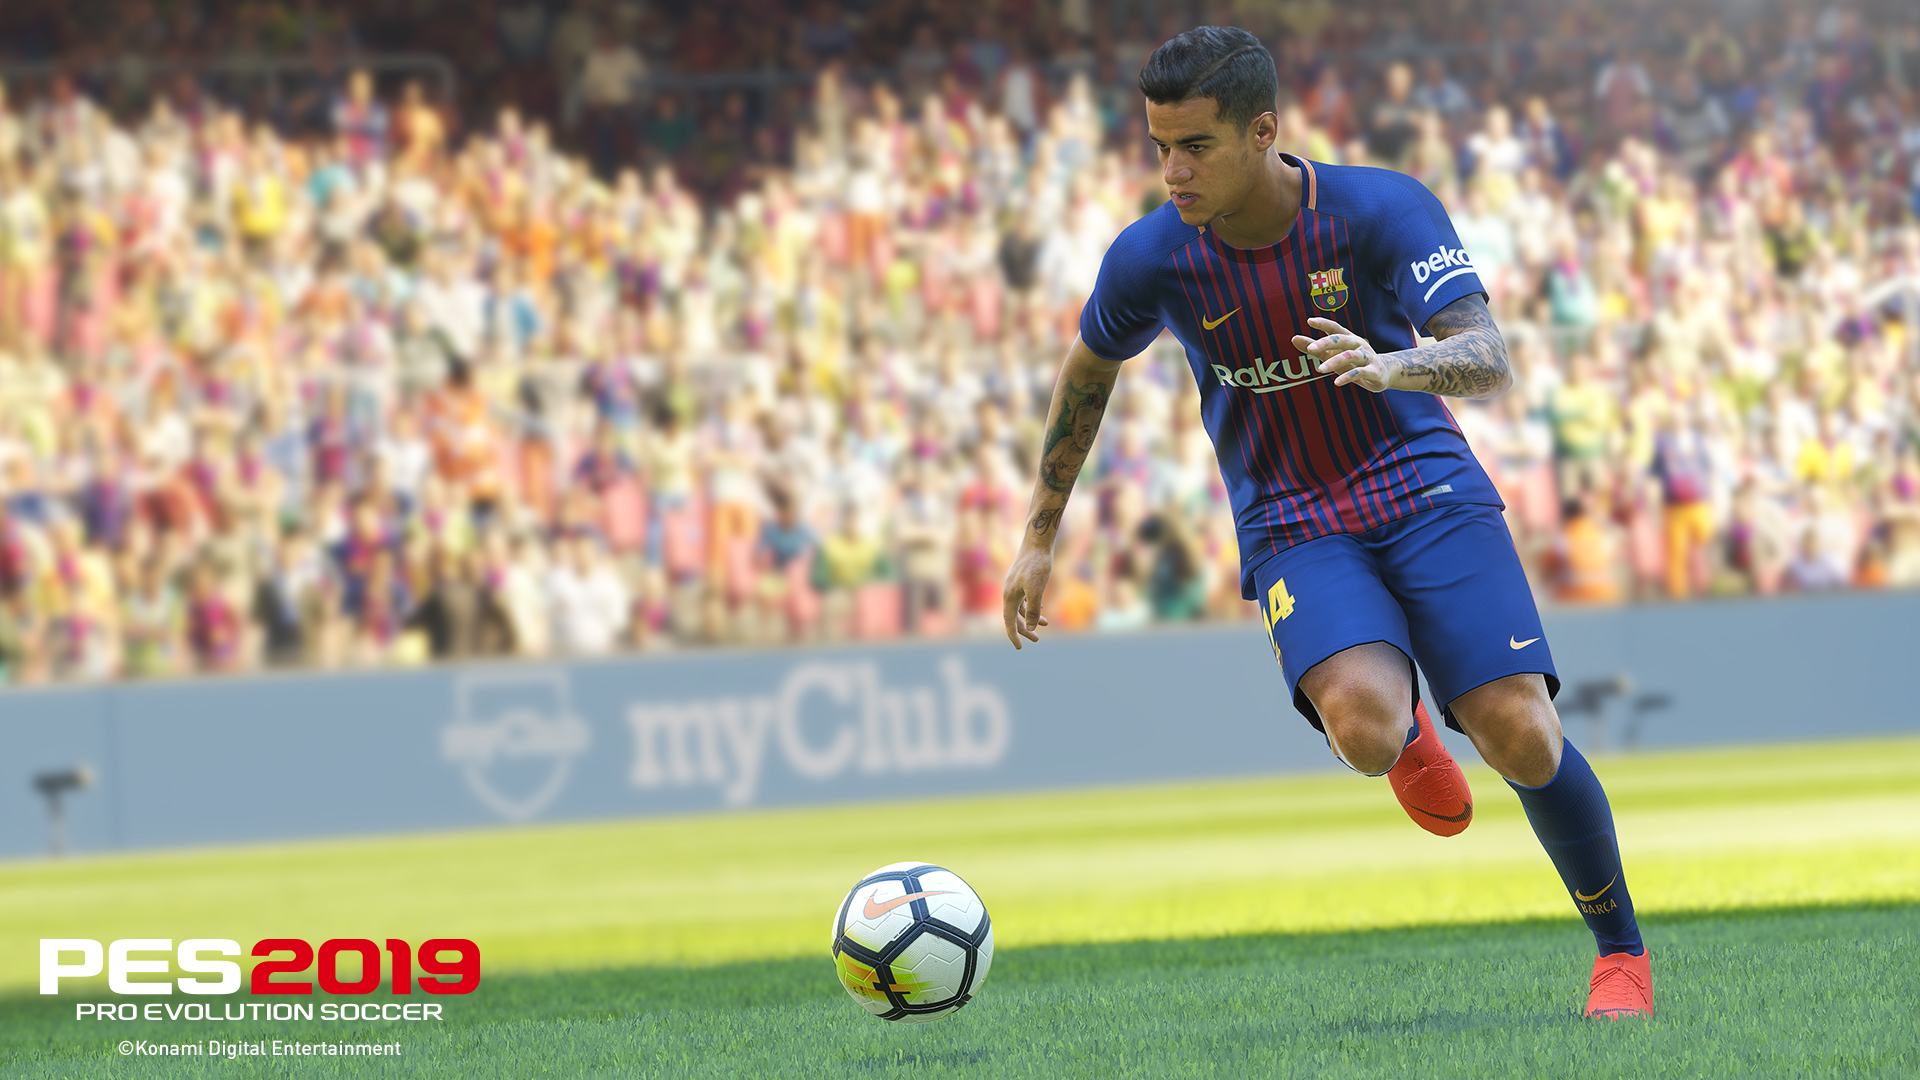 PES 2019 - can Konami close the gap on FIFA?